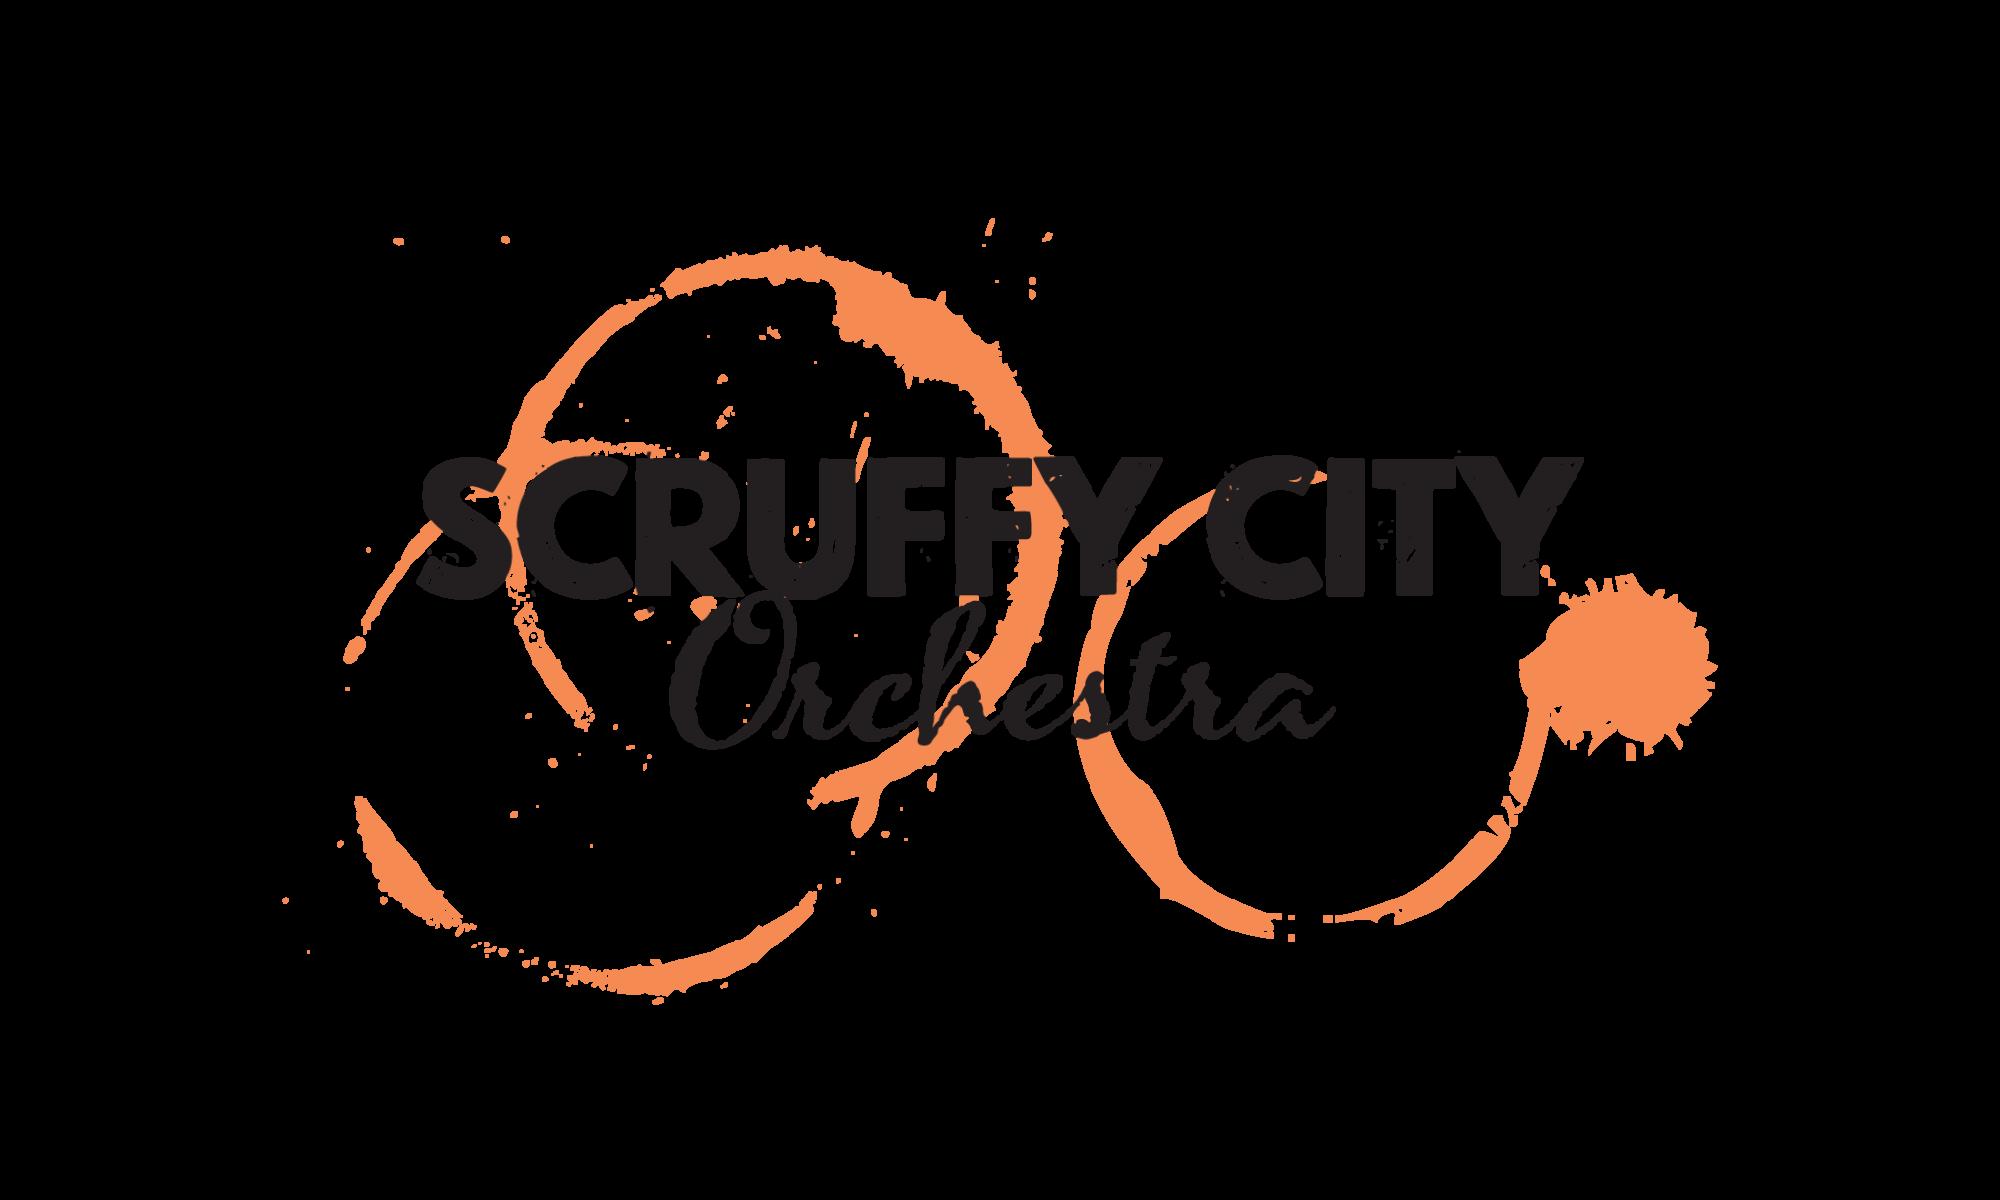 Scruffy City Orchestra